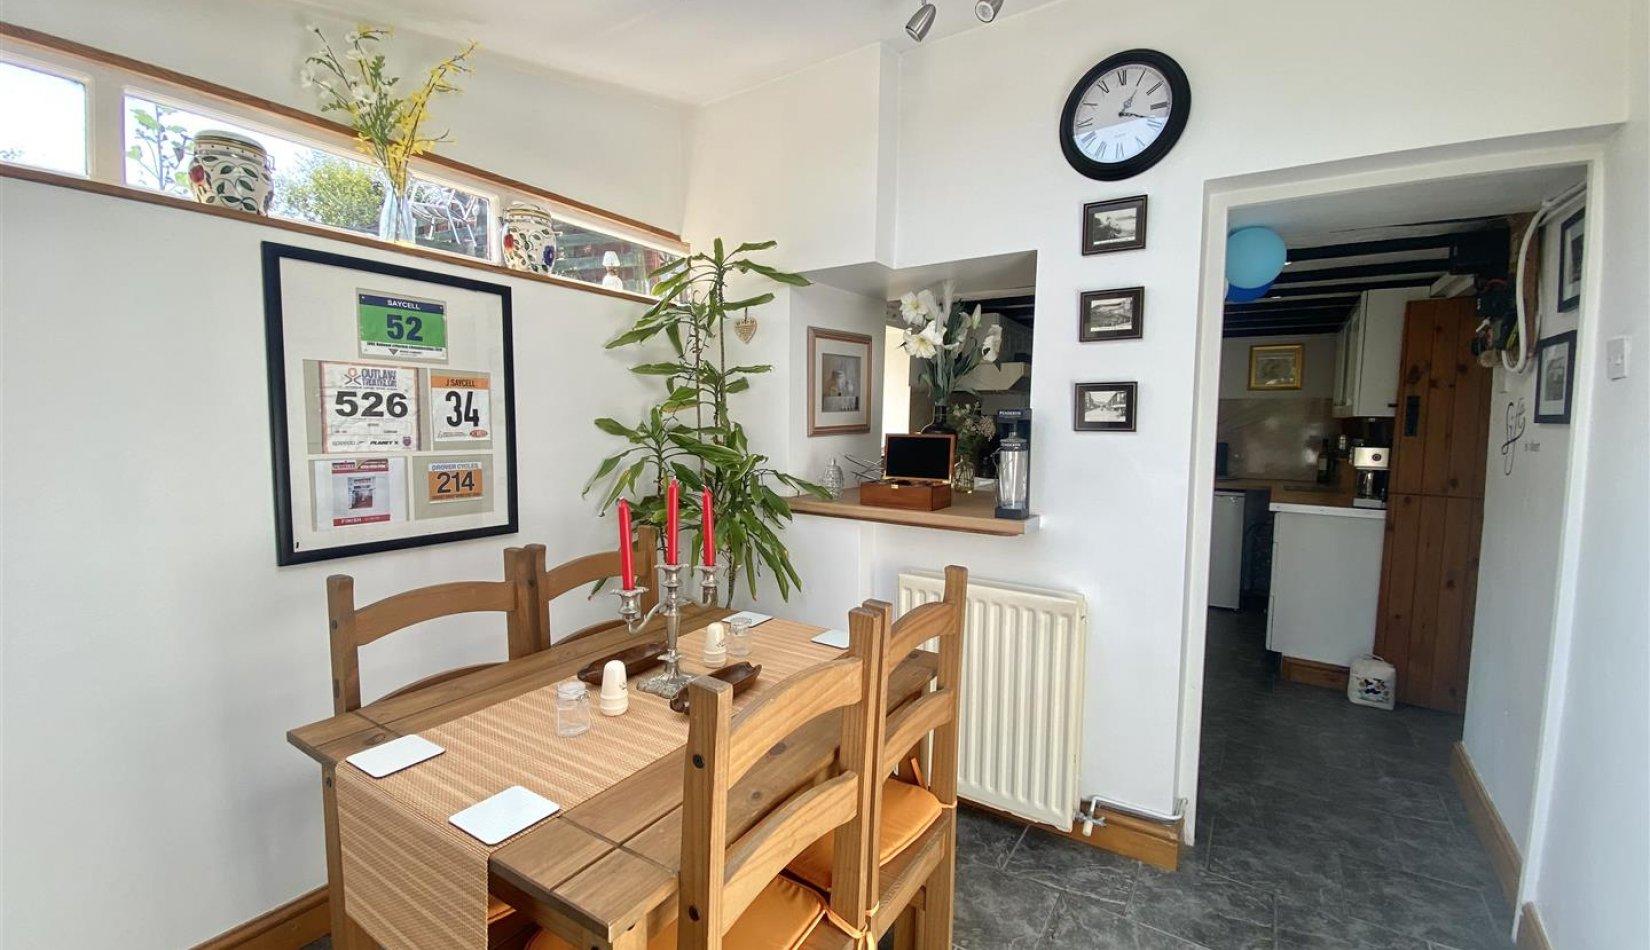 penrhiw dining area.jpg